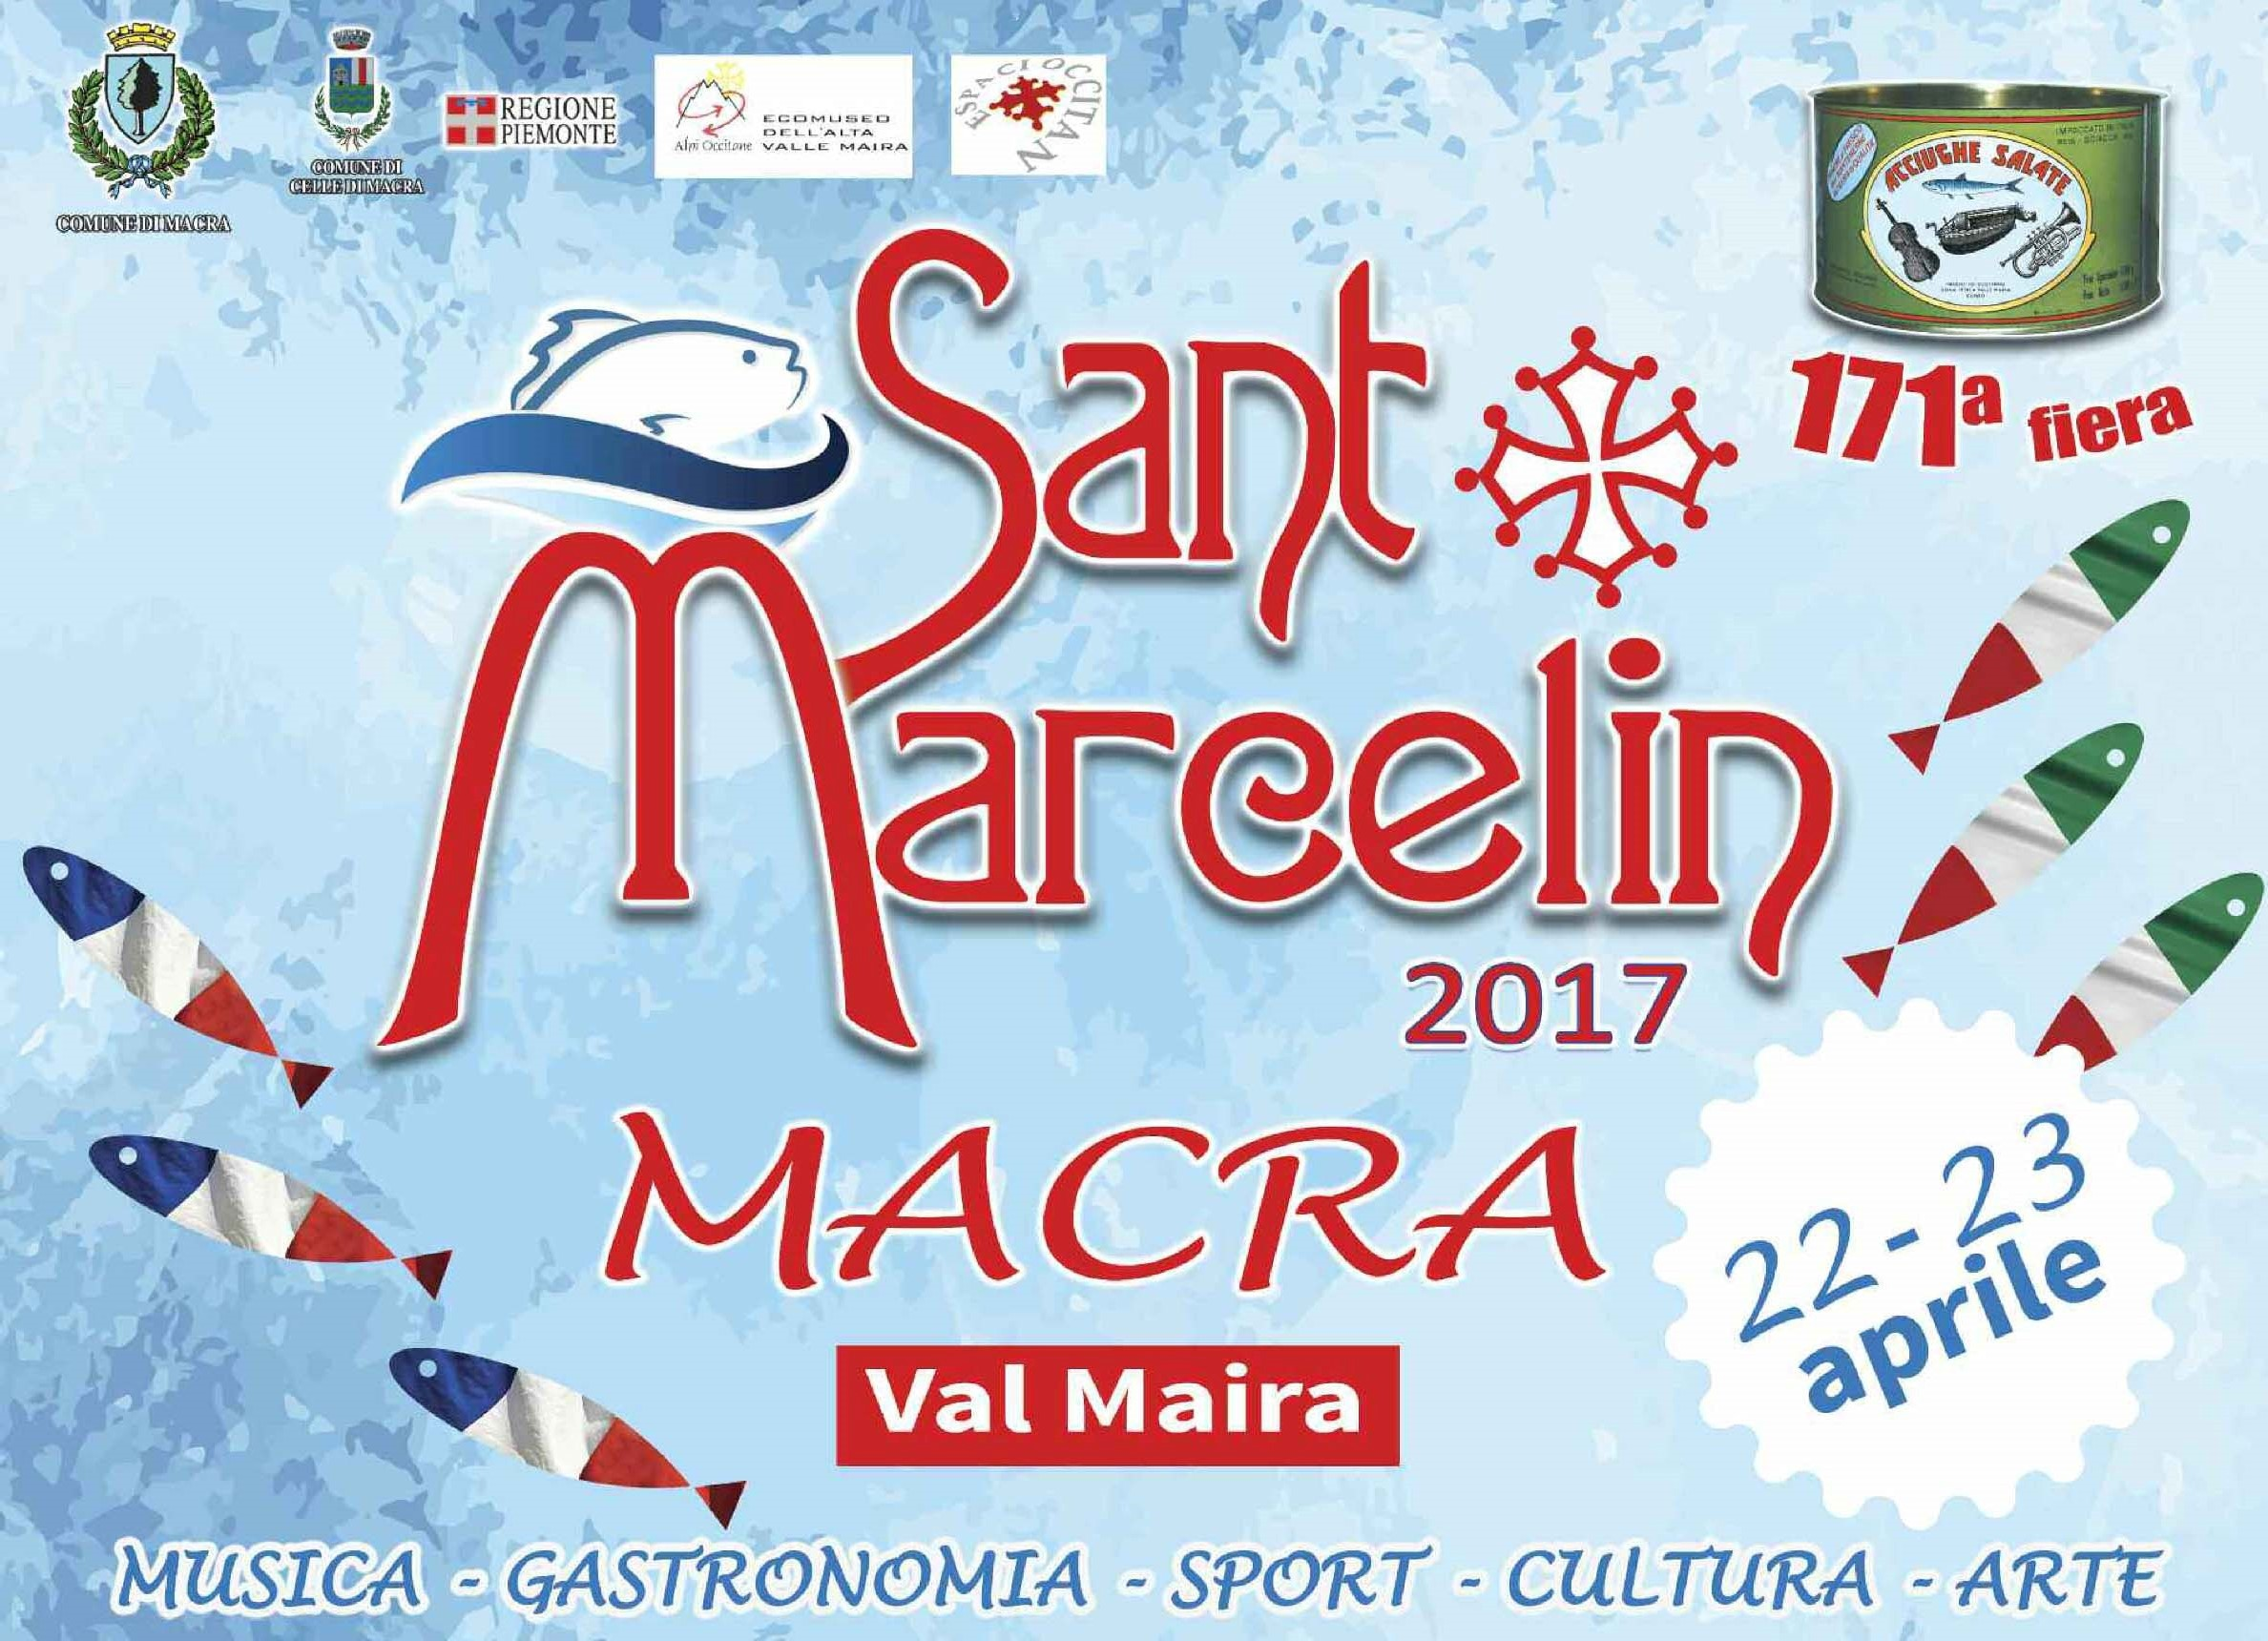 San Marcellino Macra